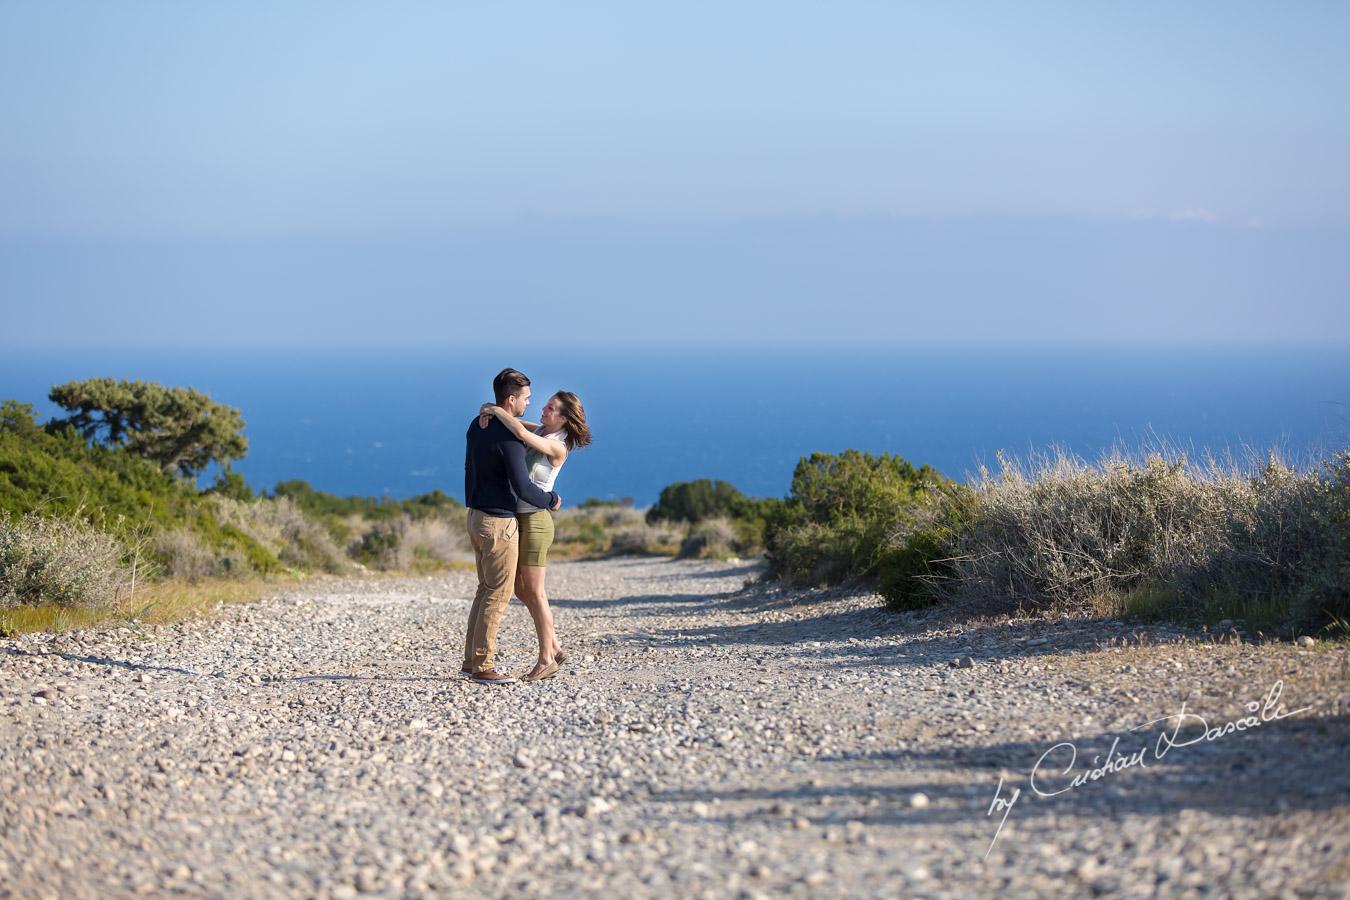 Love at first sight - Karen & Martins at Kurion Cyprus - 05